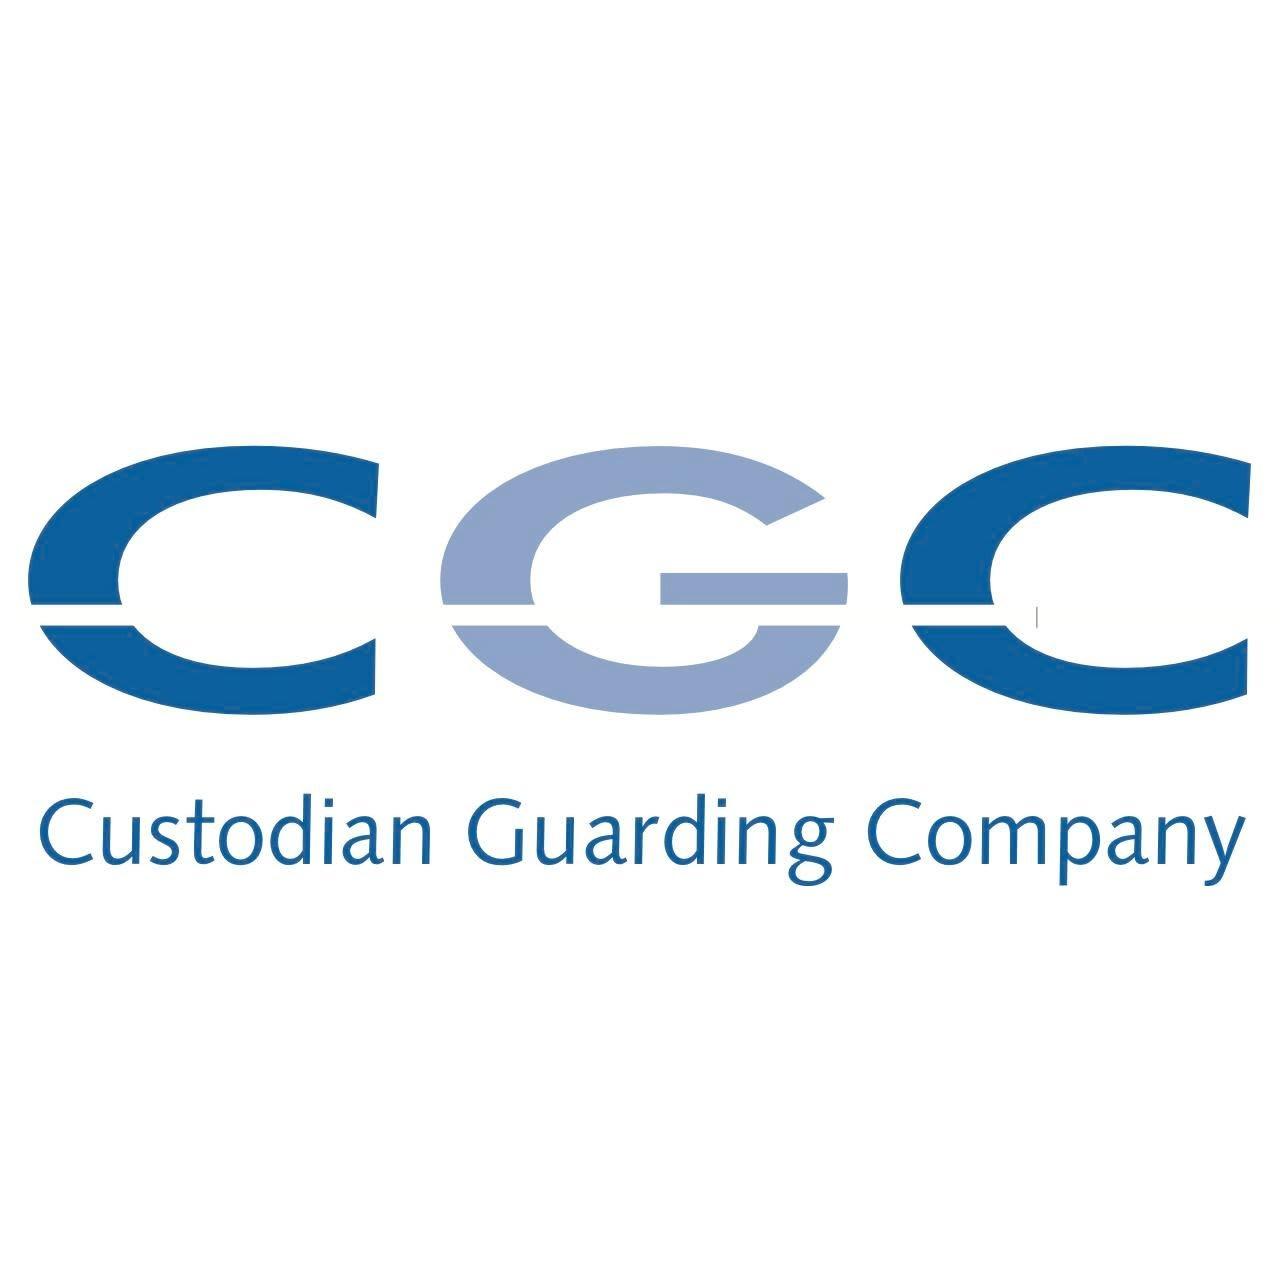 Custodian Guarding Co - Wirral, Merseyside CH62 1EH - 08455 195890   ShowMeLocal.com